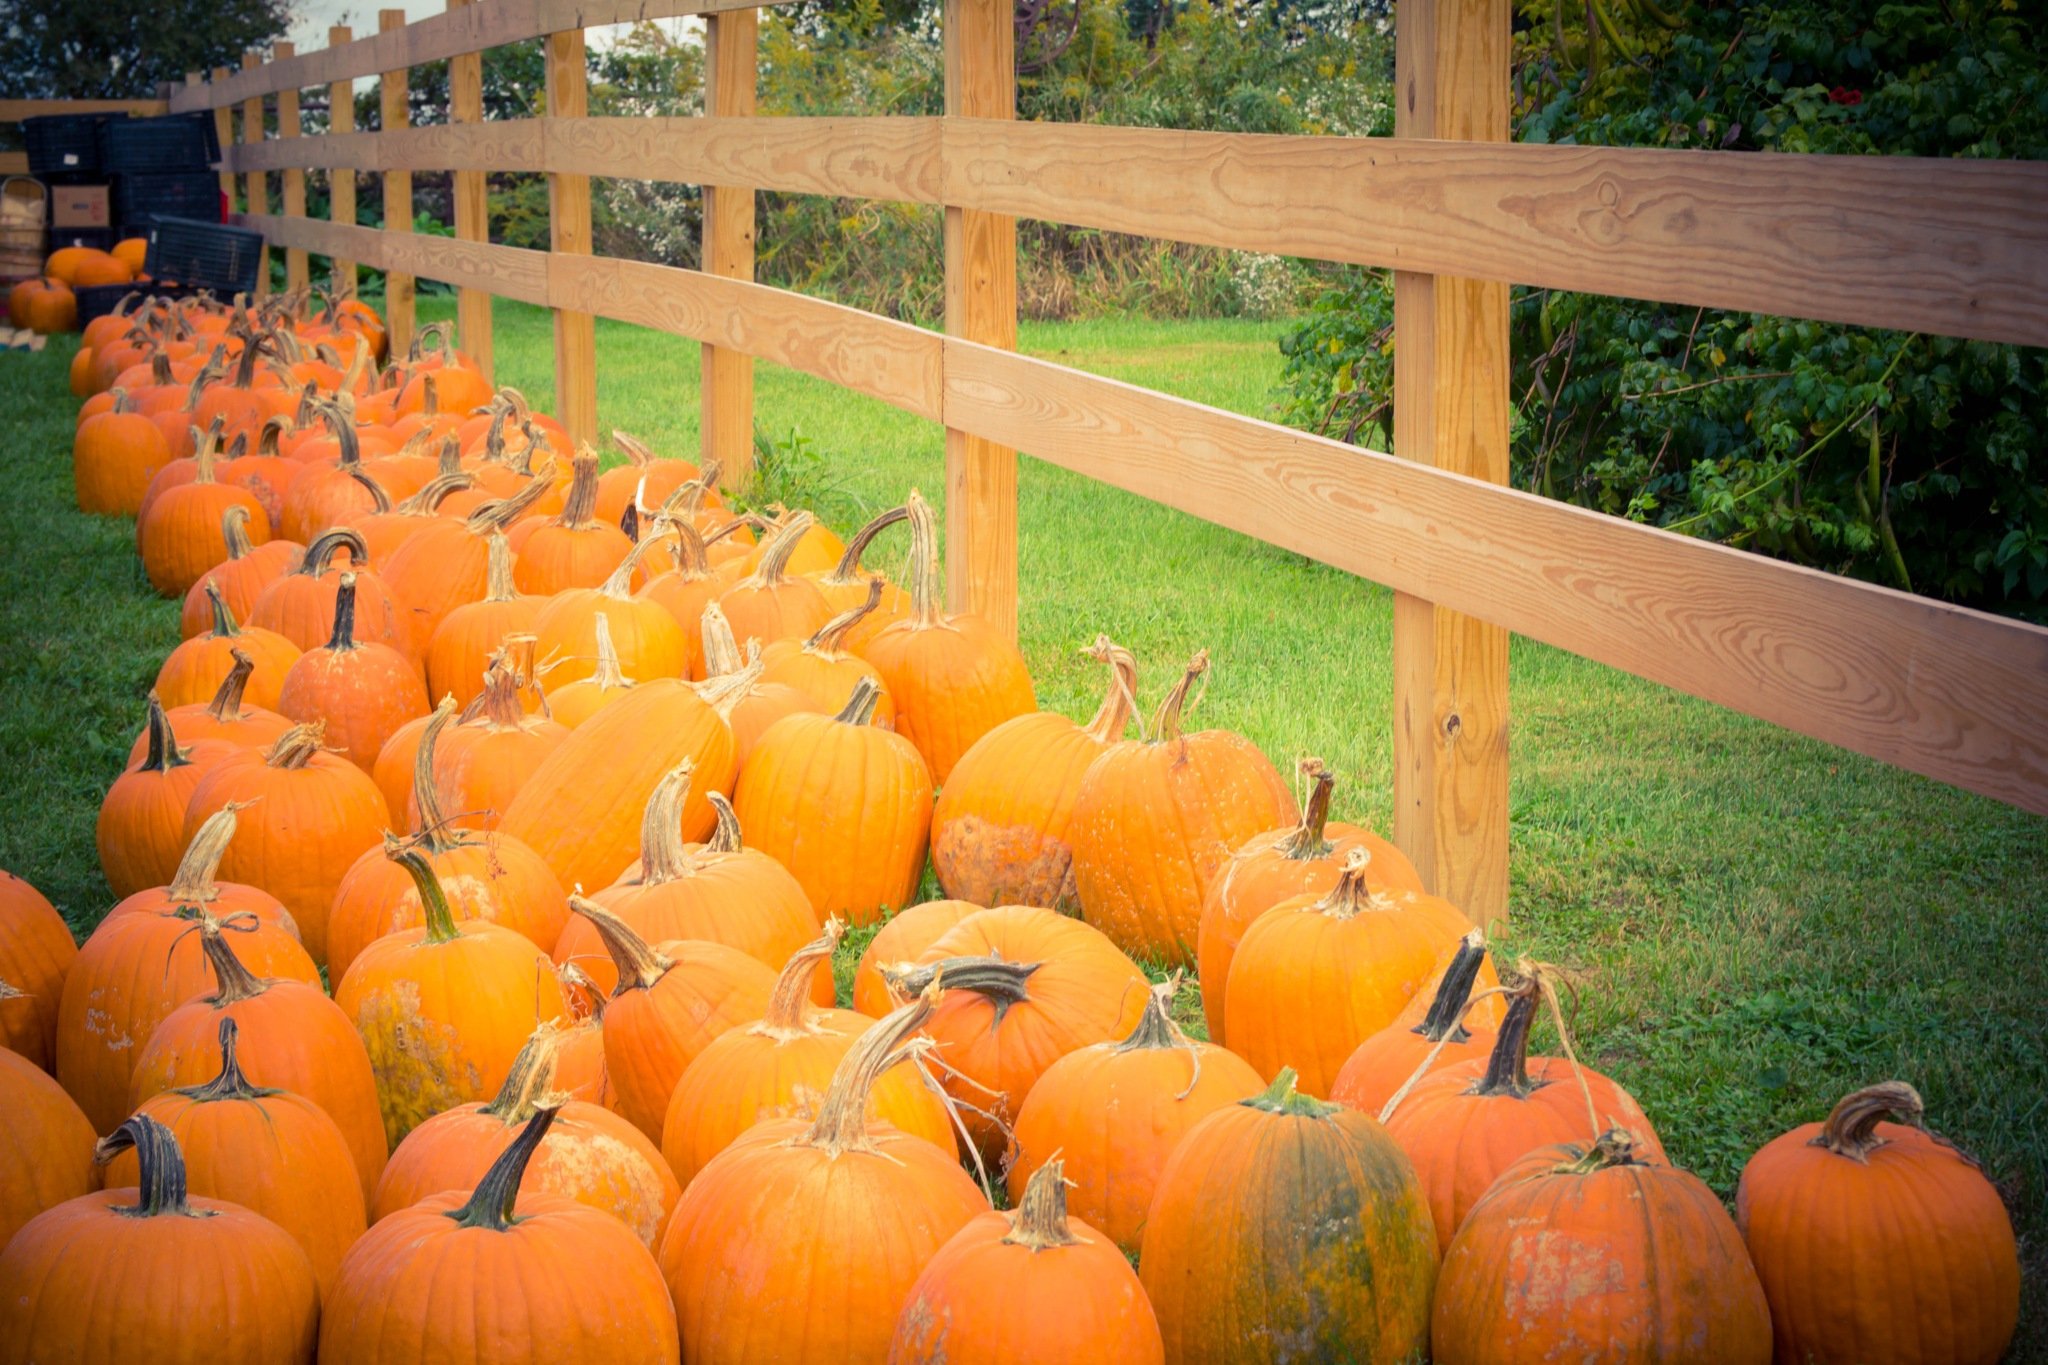 Pumpkins Pumpkins by MissyP87